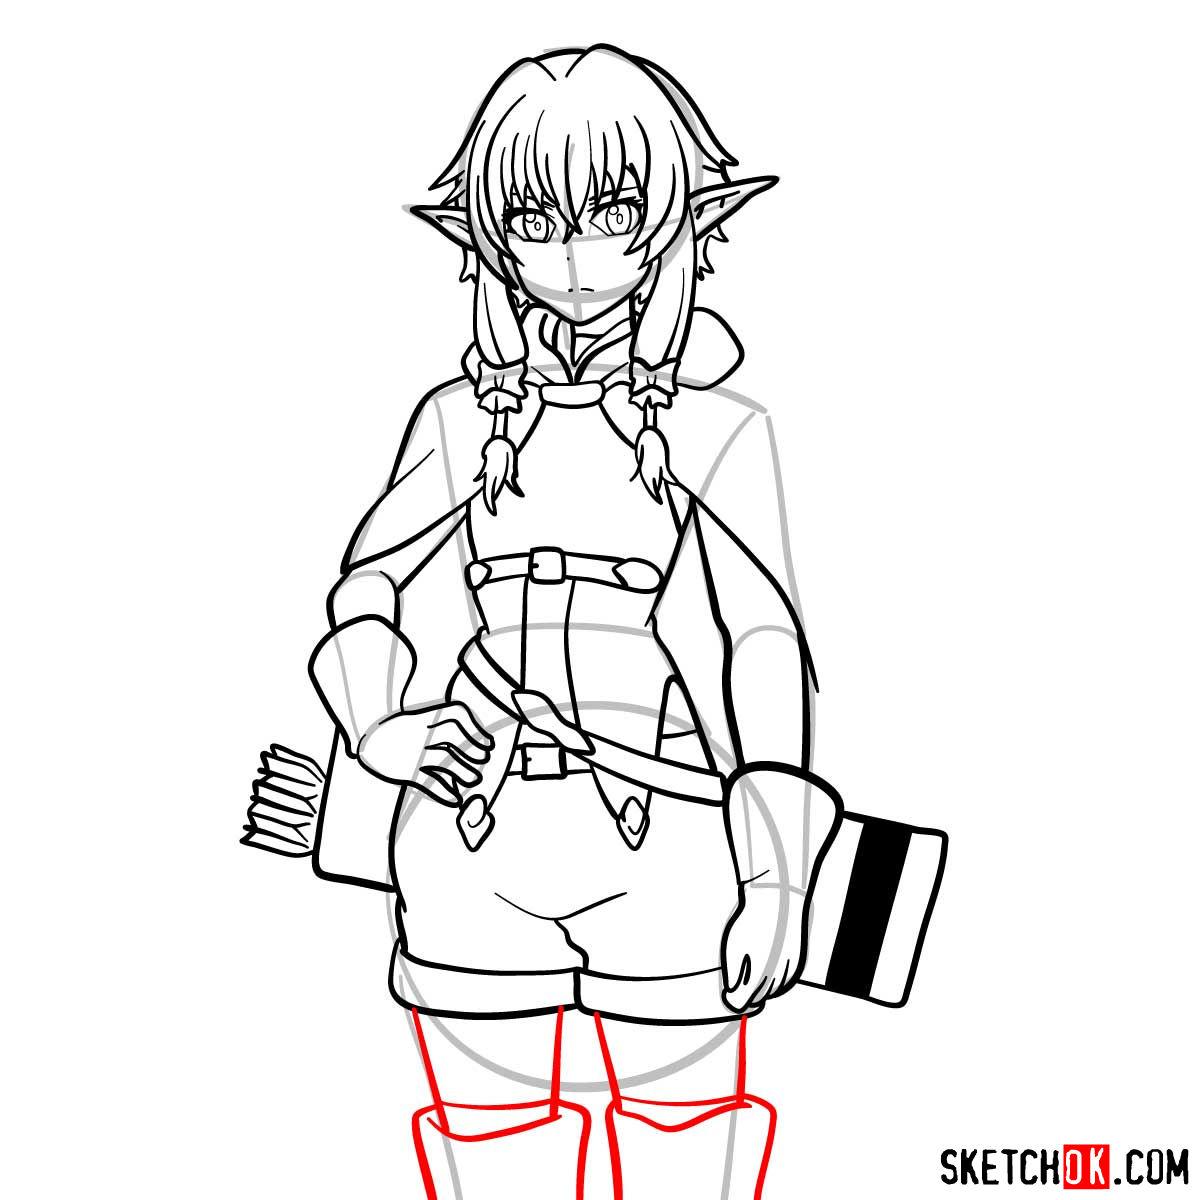 20 steps drawing tutorial of High Elf Archer (Goblin